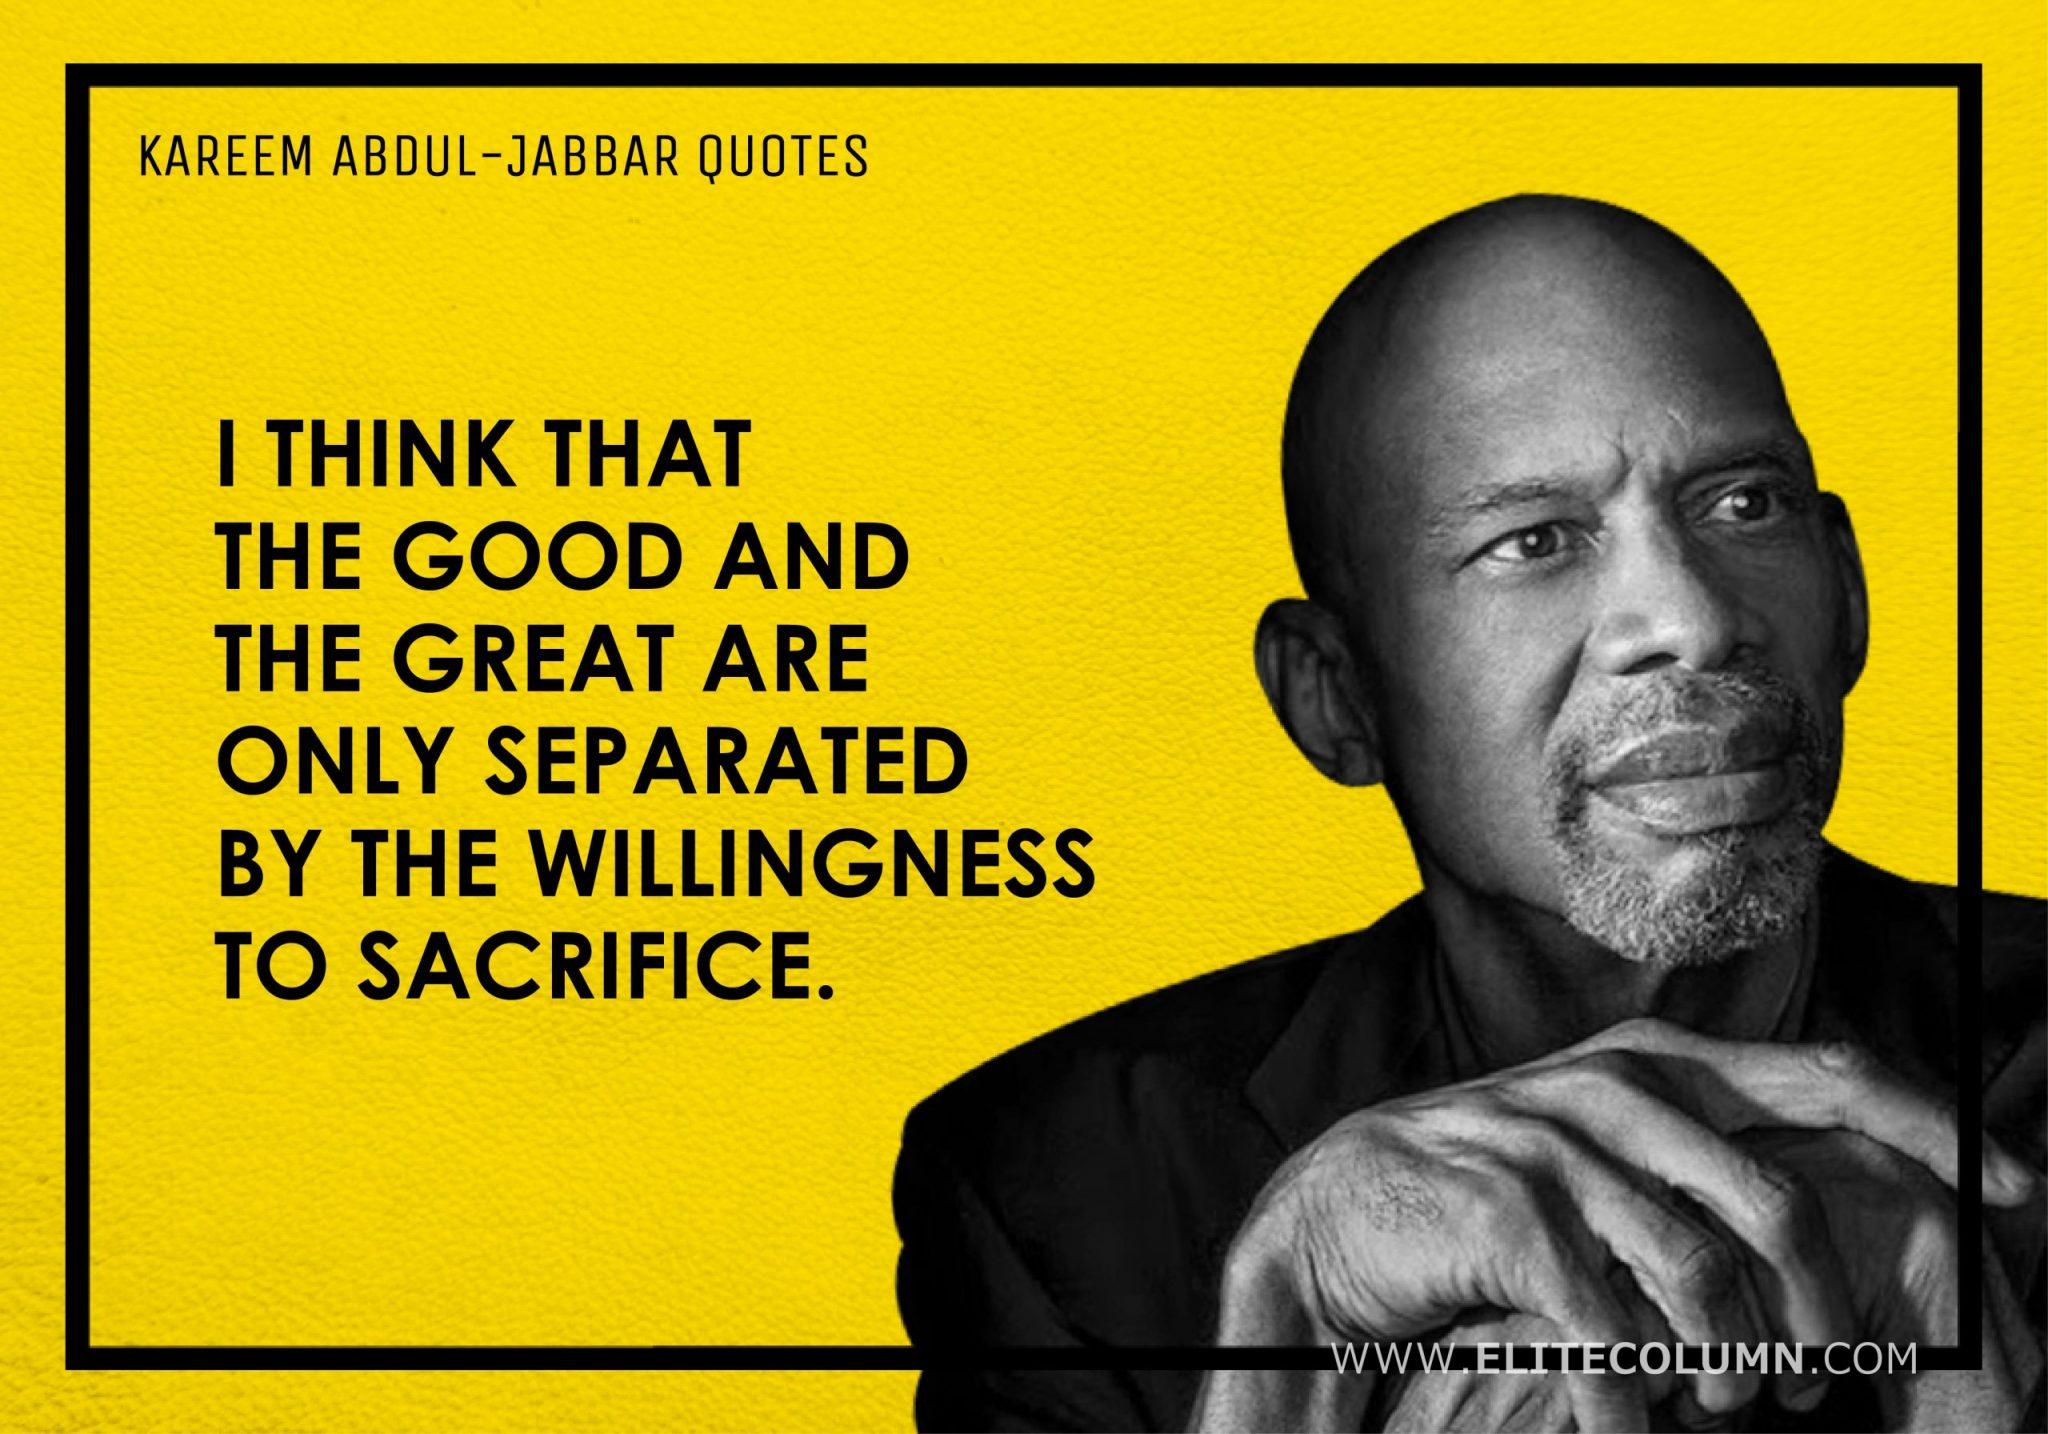 Kareem Abdul-Jabbar Quotes (4)